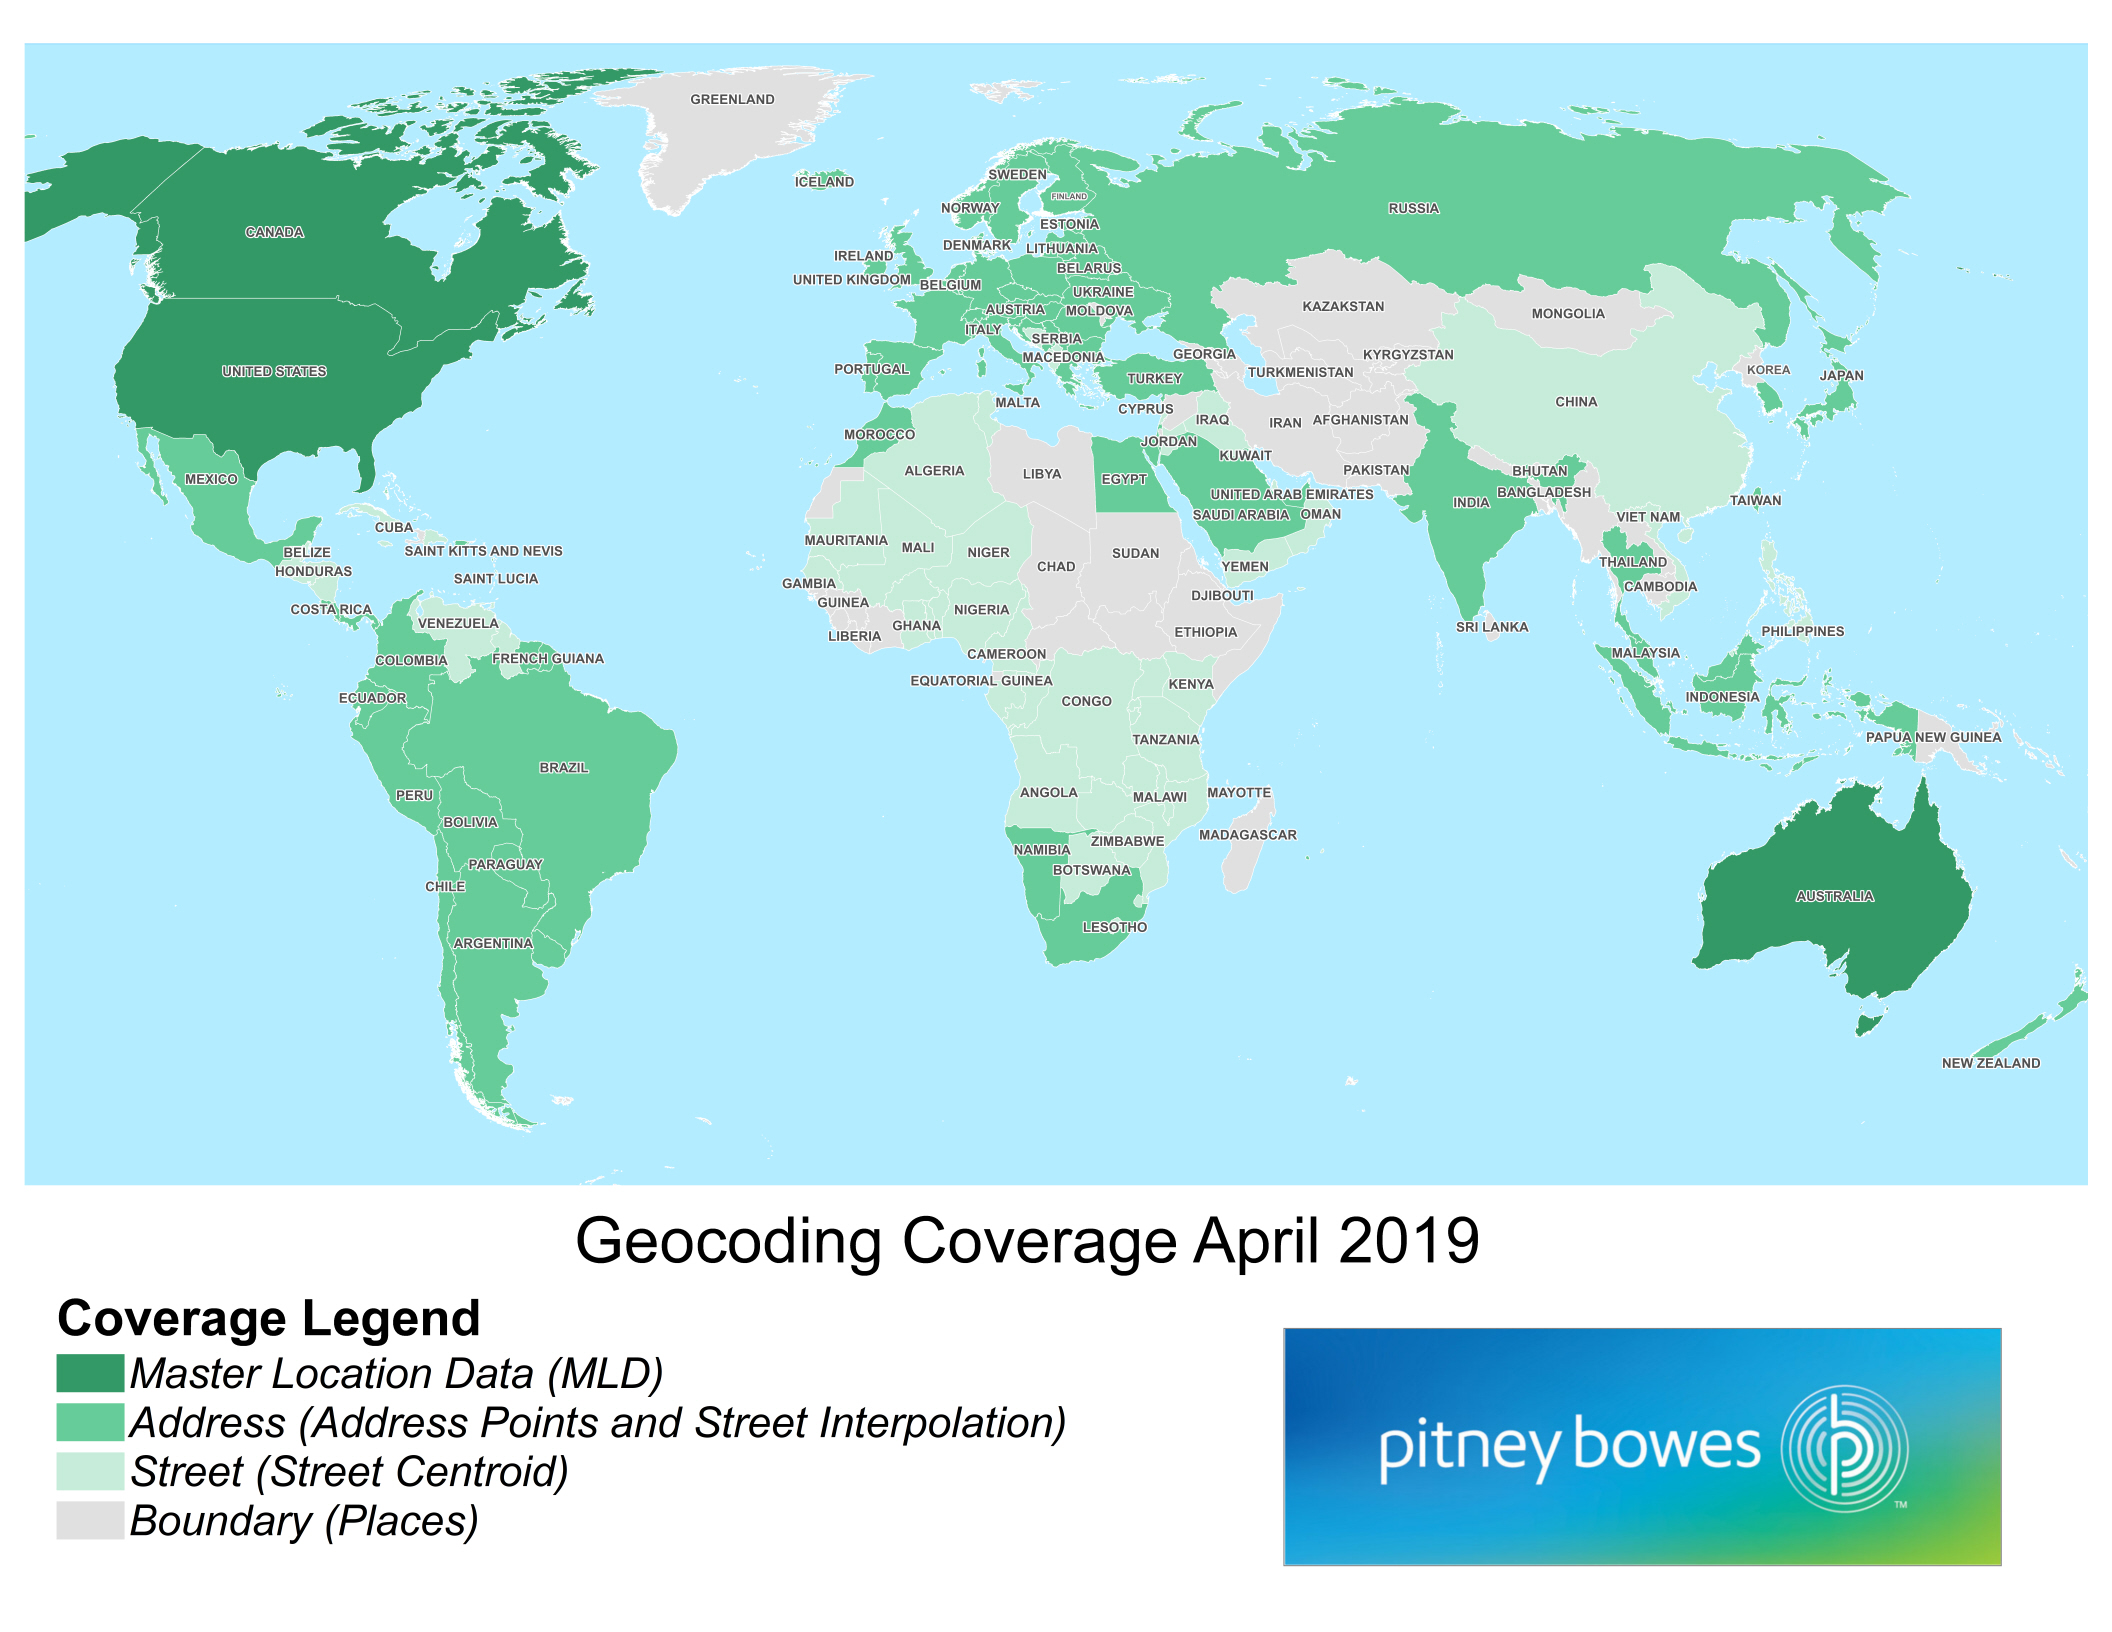 GeocodingCoverageMap201903